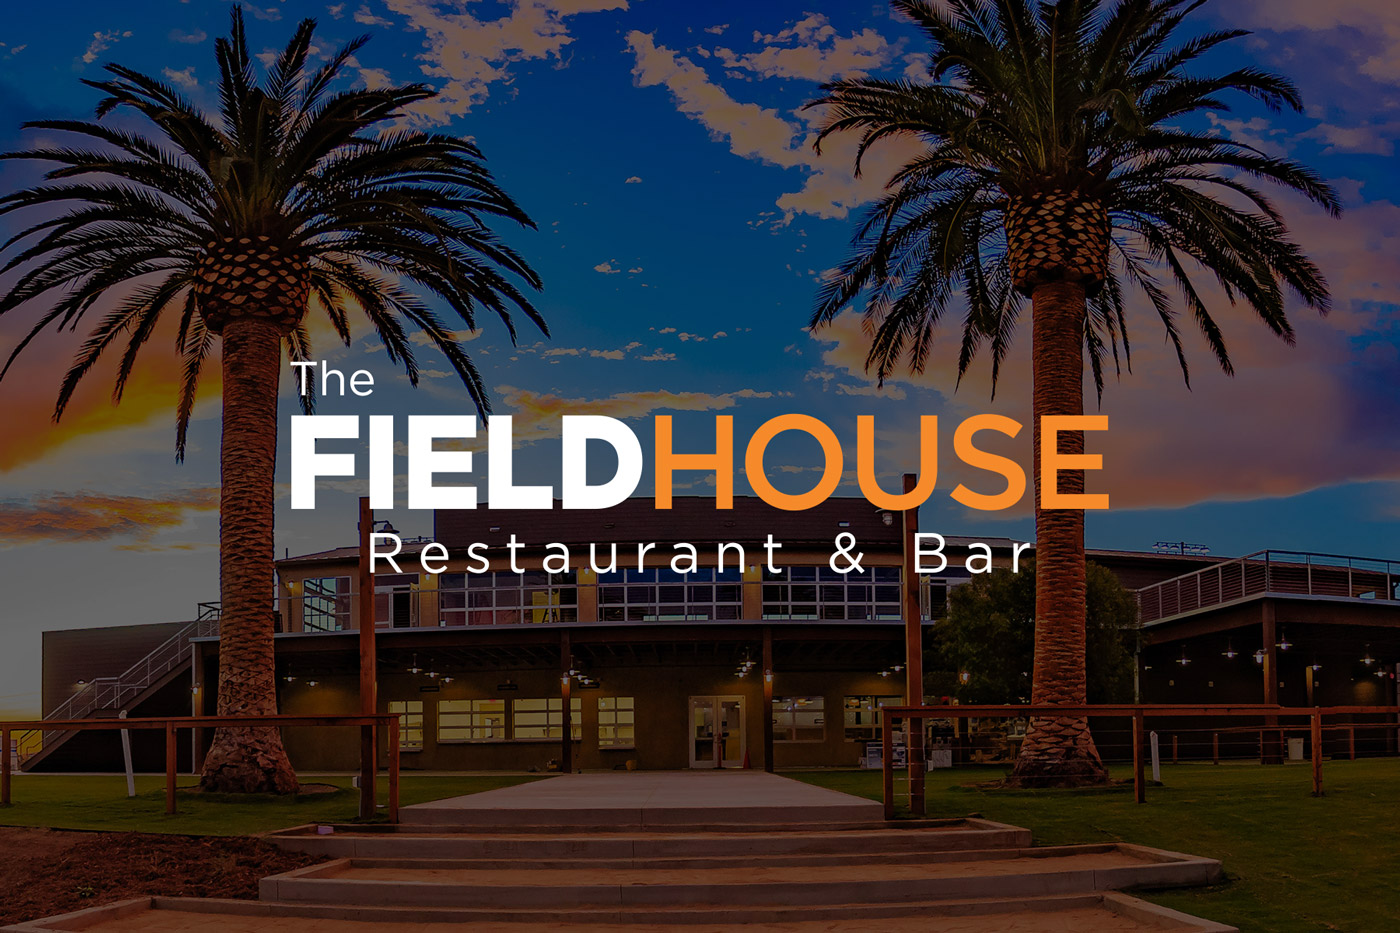 The FieldHouse - SilverLakesTournaments.com